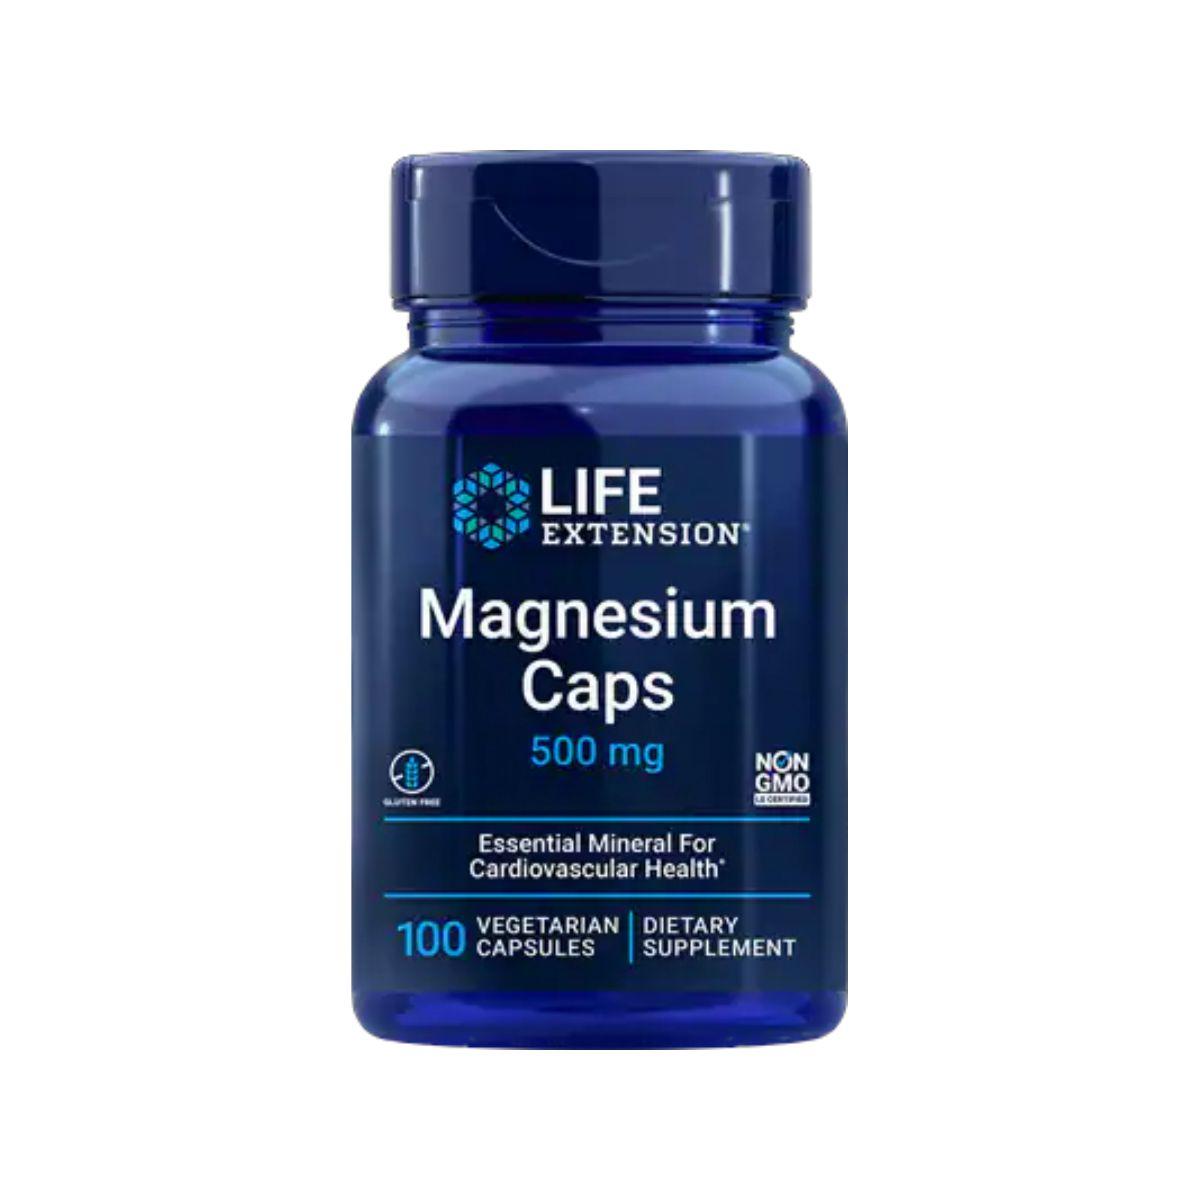 Magnesium Caps 500mg 100 Vegetarian Caps - Life Extension